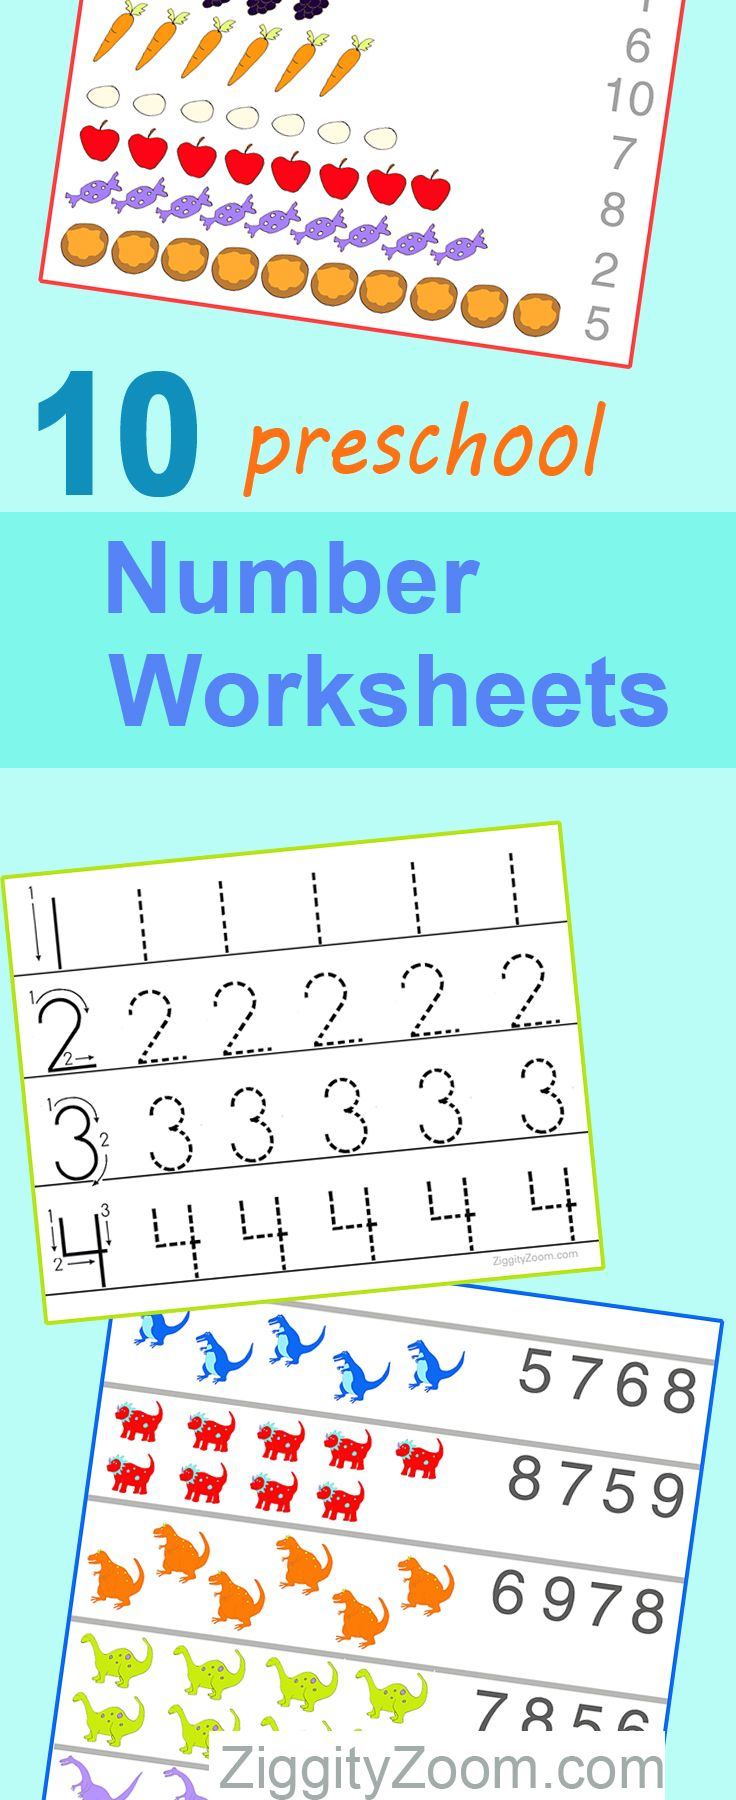 20 Beautiful Kindergarten Math Worksheets Number Recognition Images ...